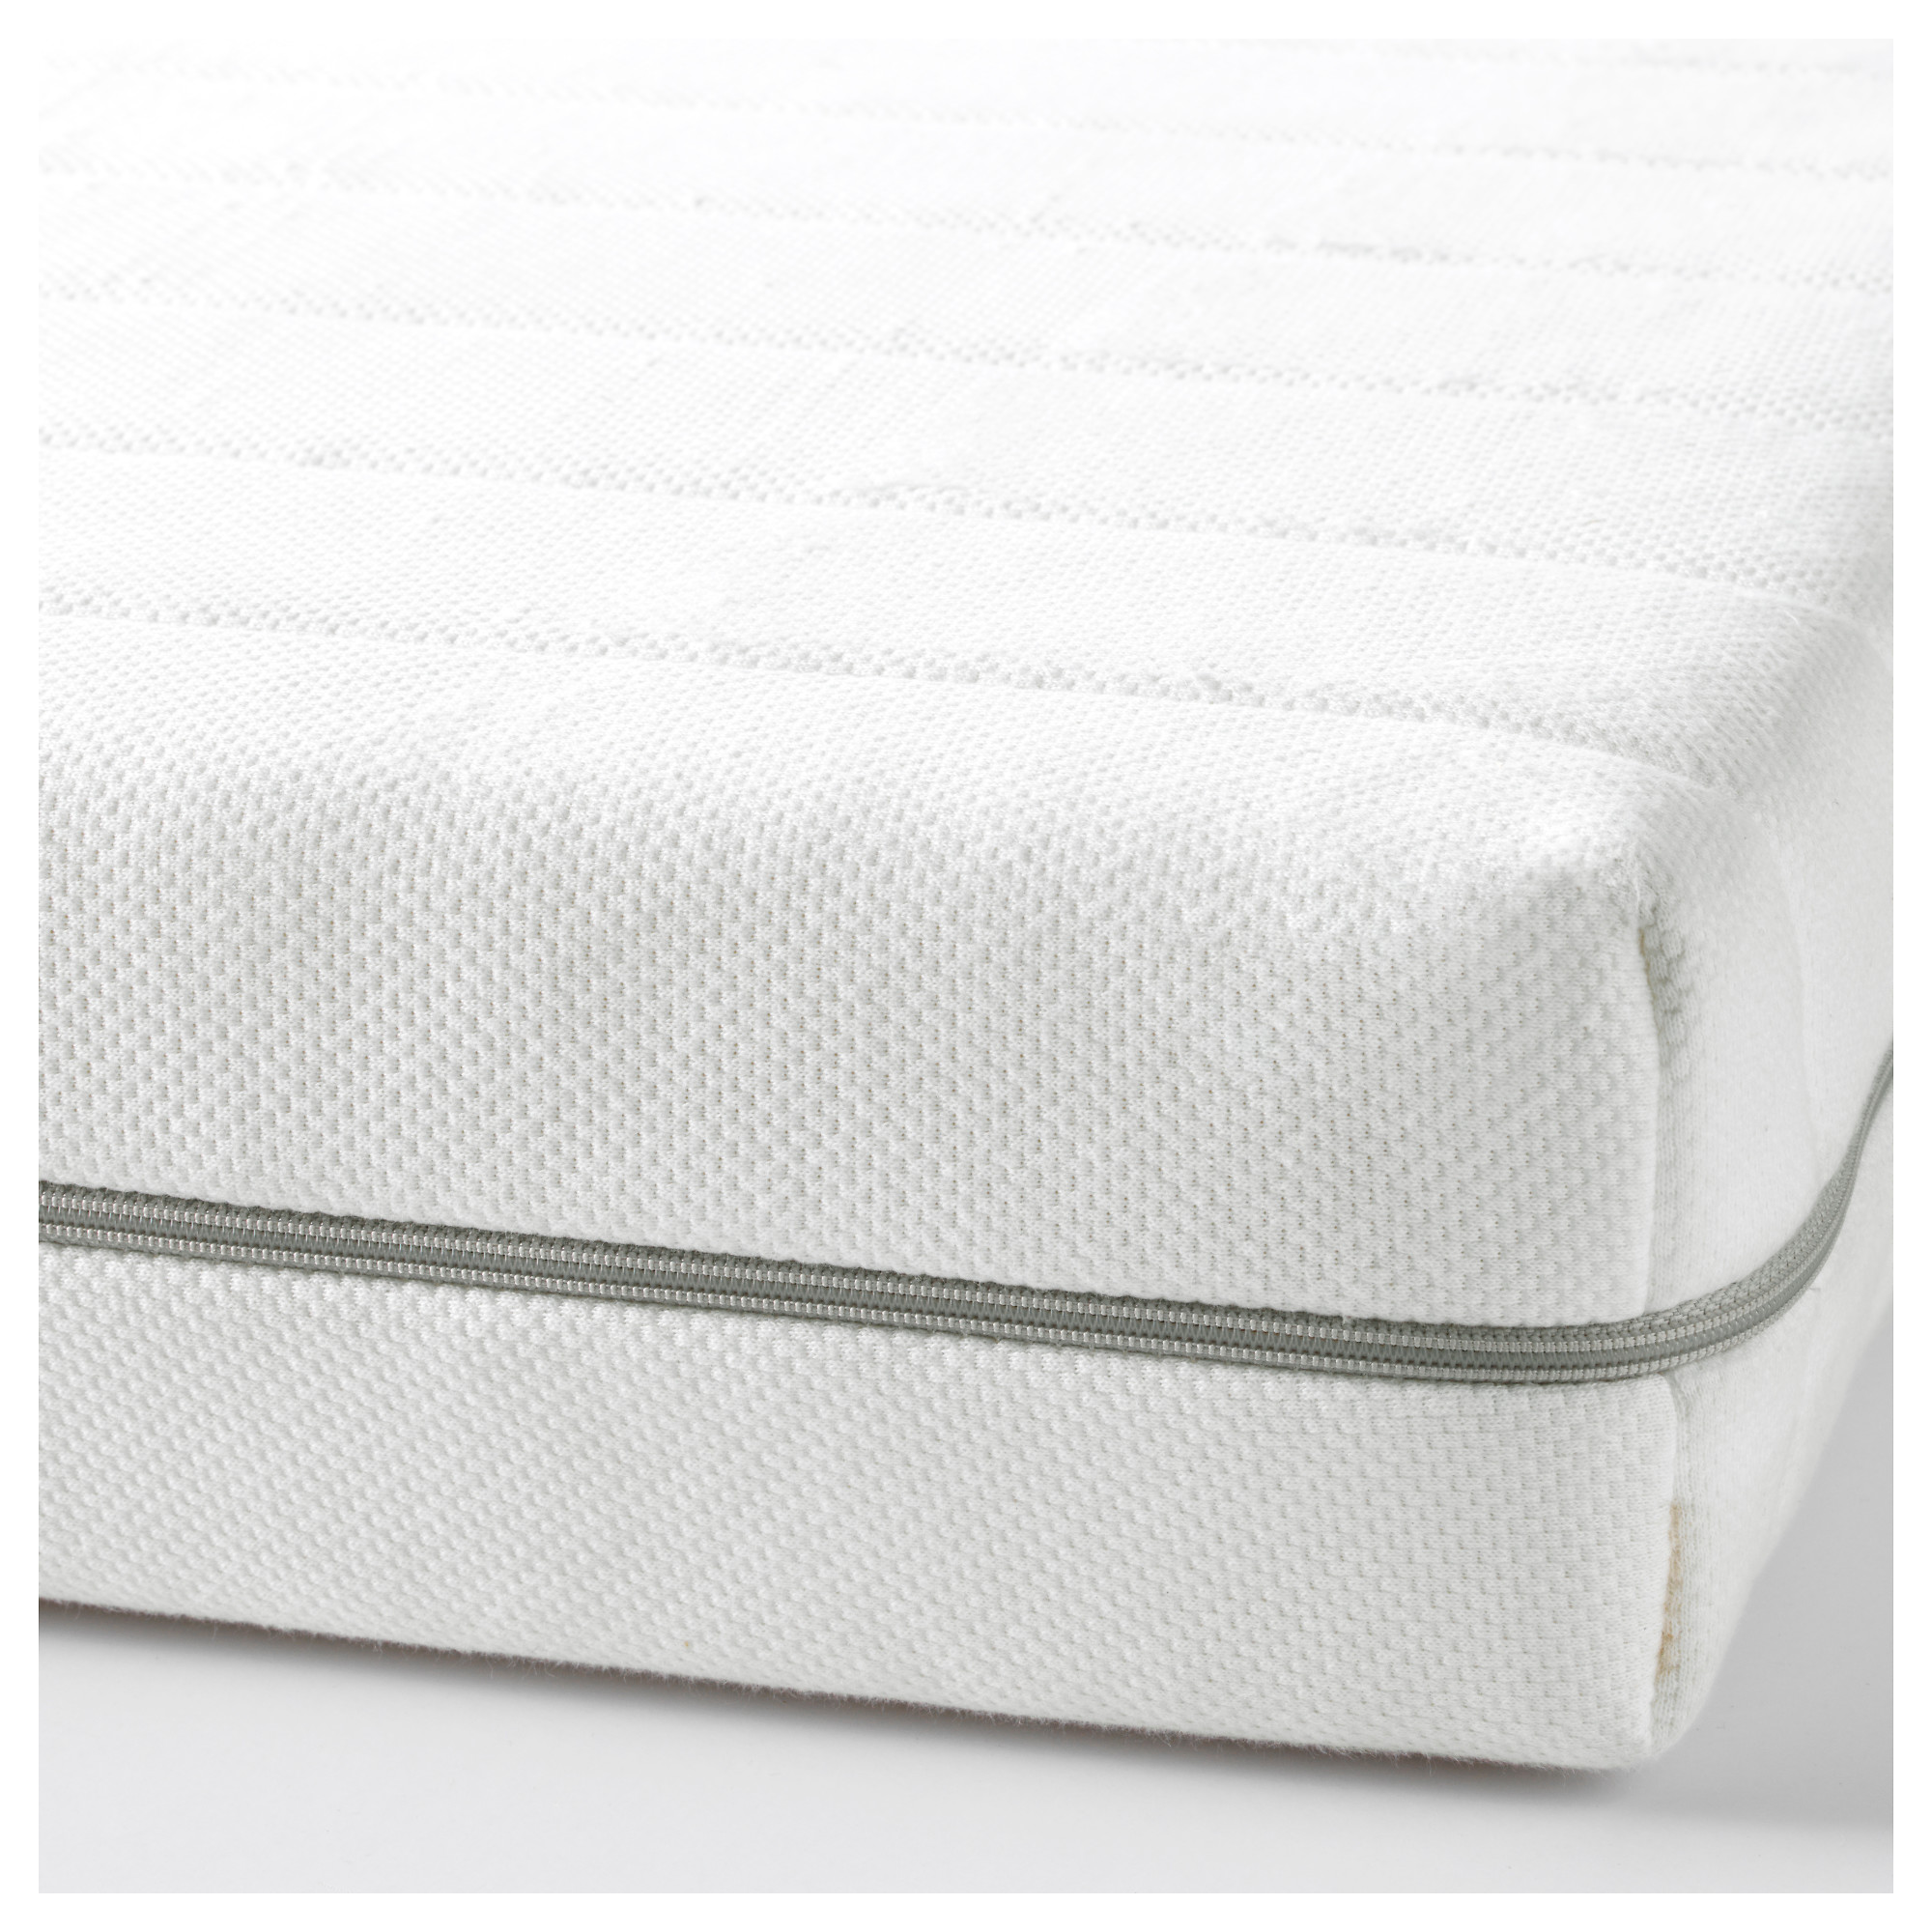 separation shoes 7e6cb 0303b MALFORS - foam mattress, firm/white | IKEA Hong Kong